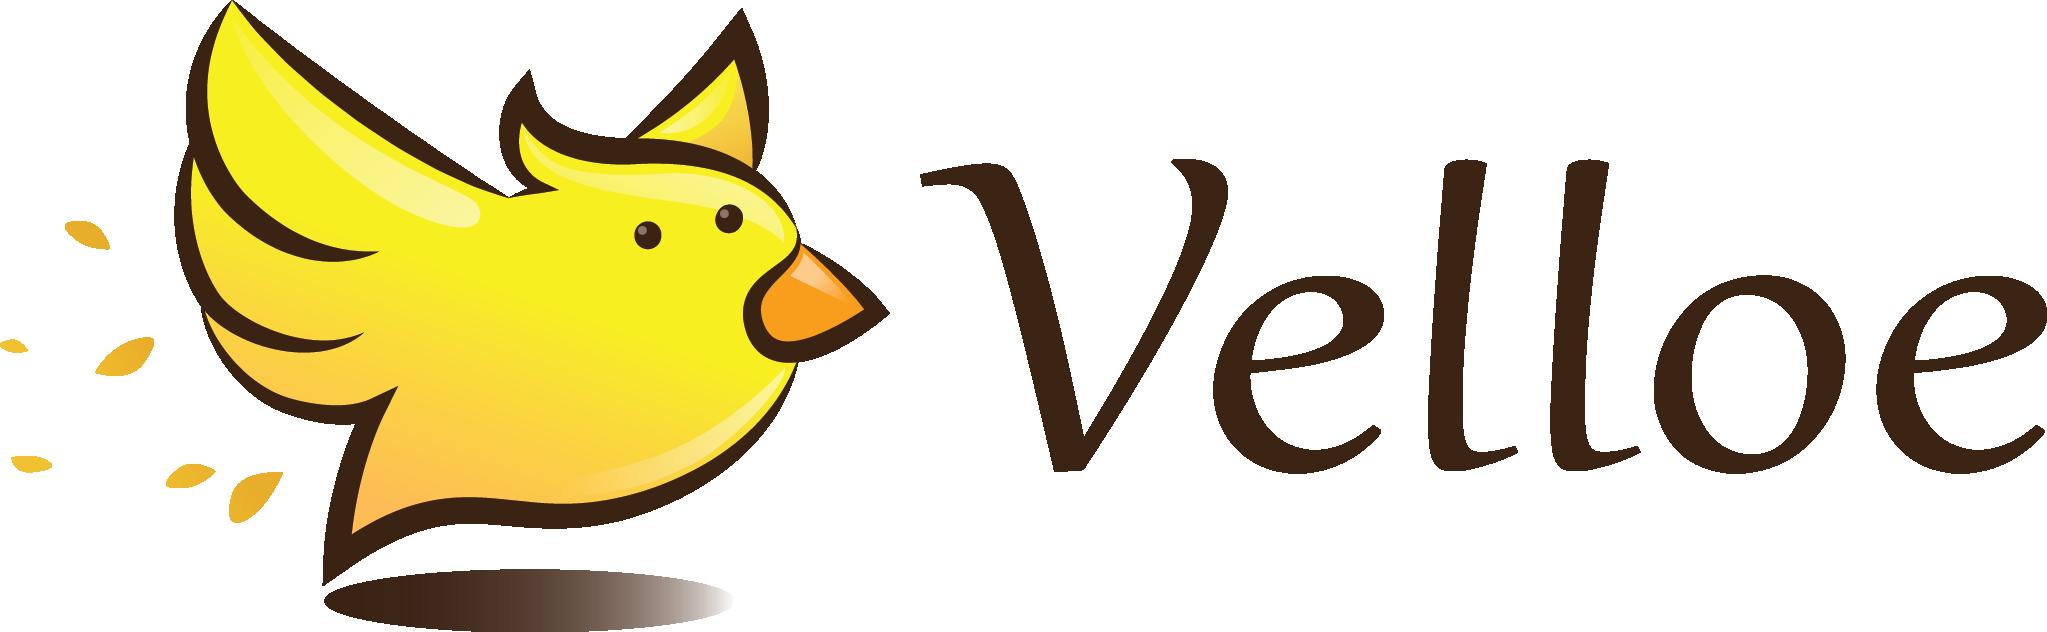 Velloe press kit a. Volunteering clipart goodness